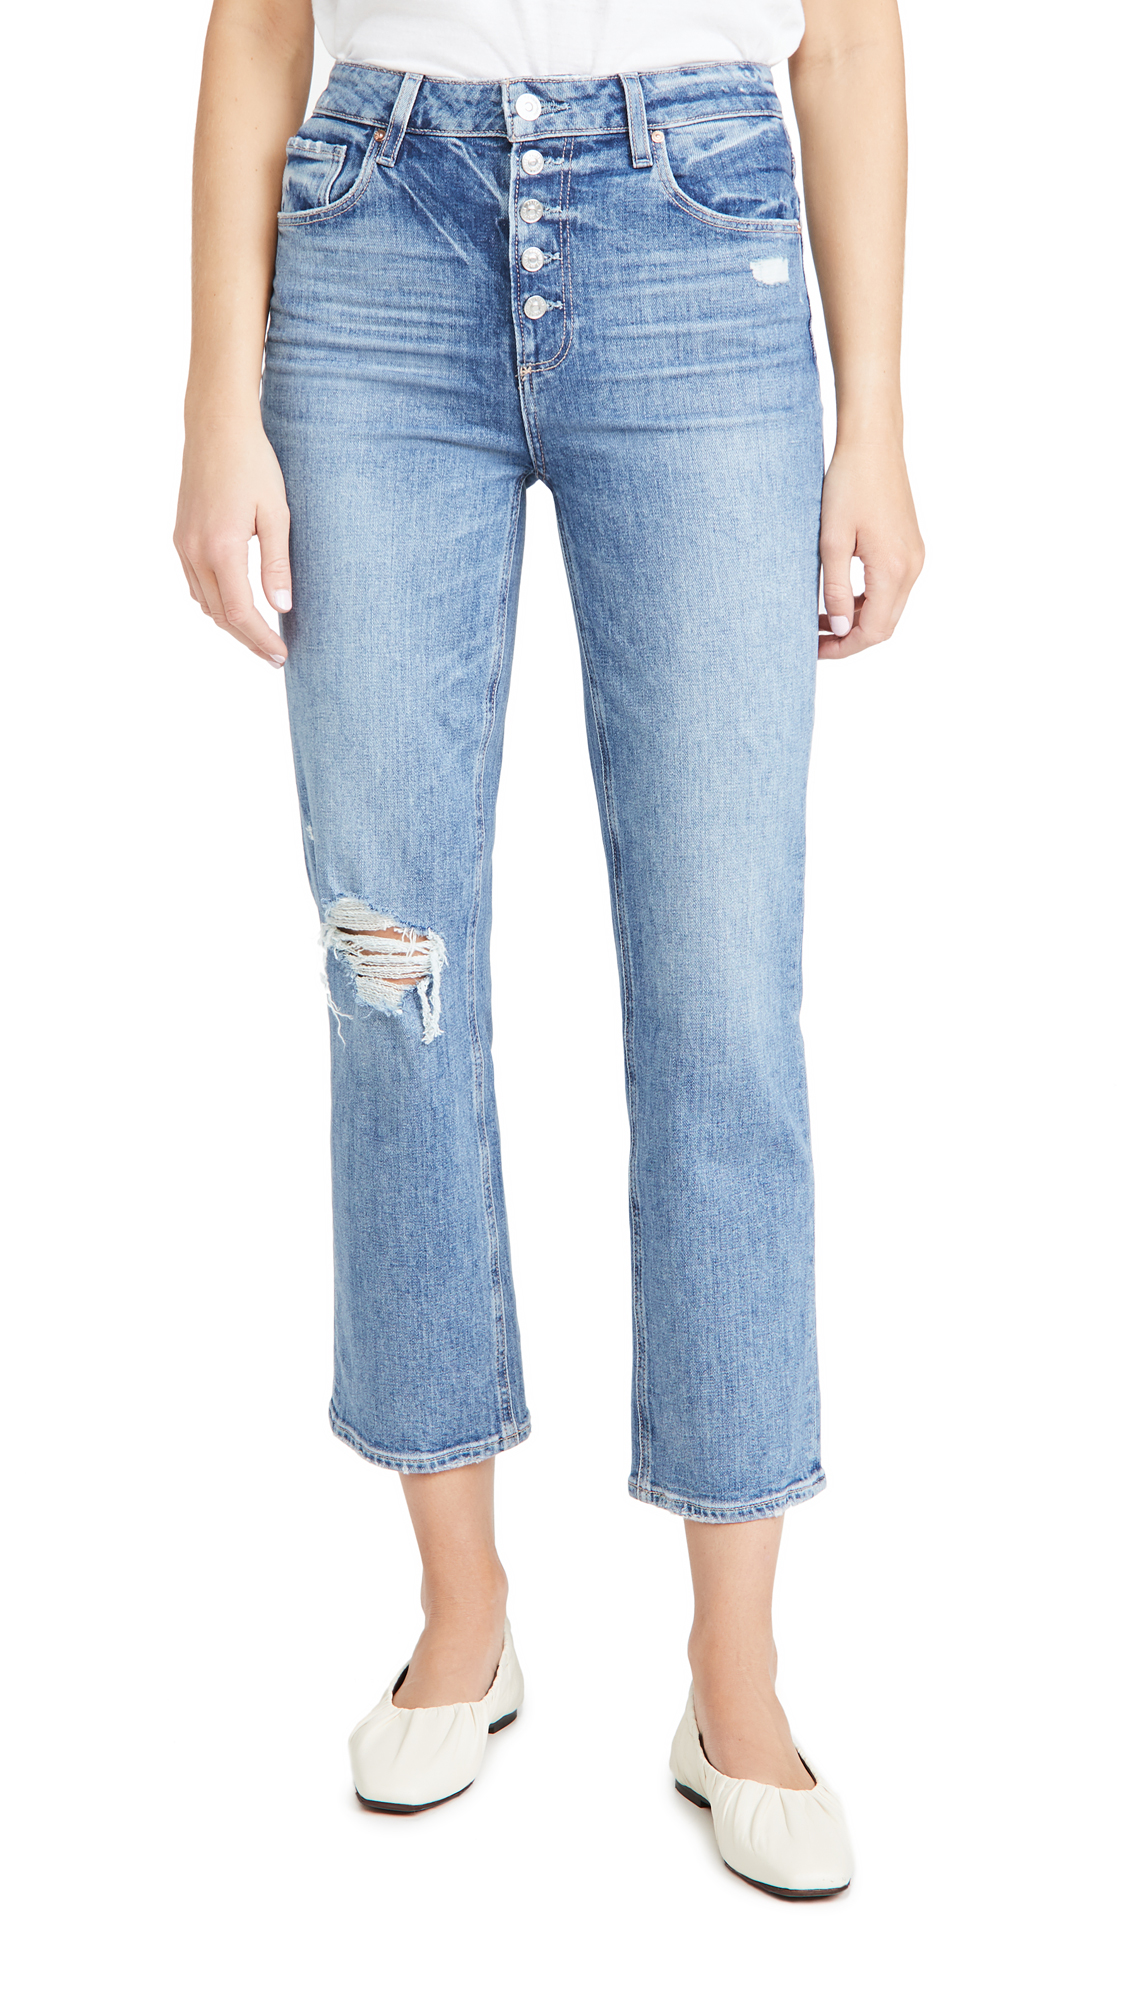 PAIGE Sarah Straight Ankle Jeans